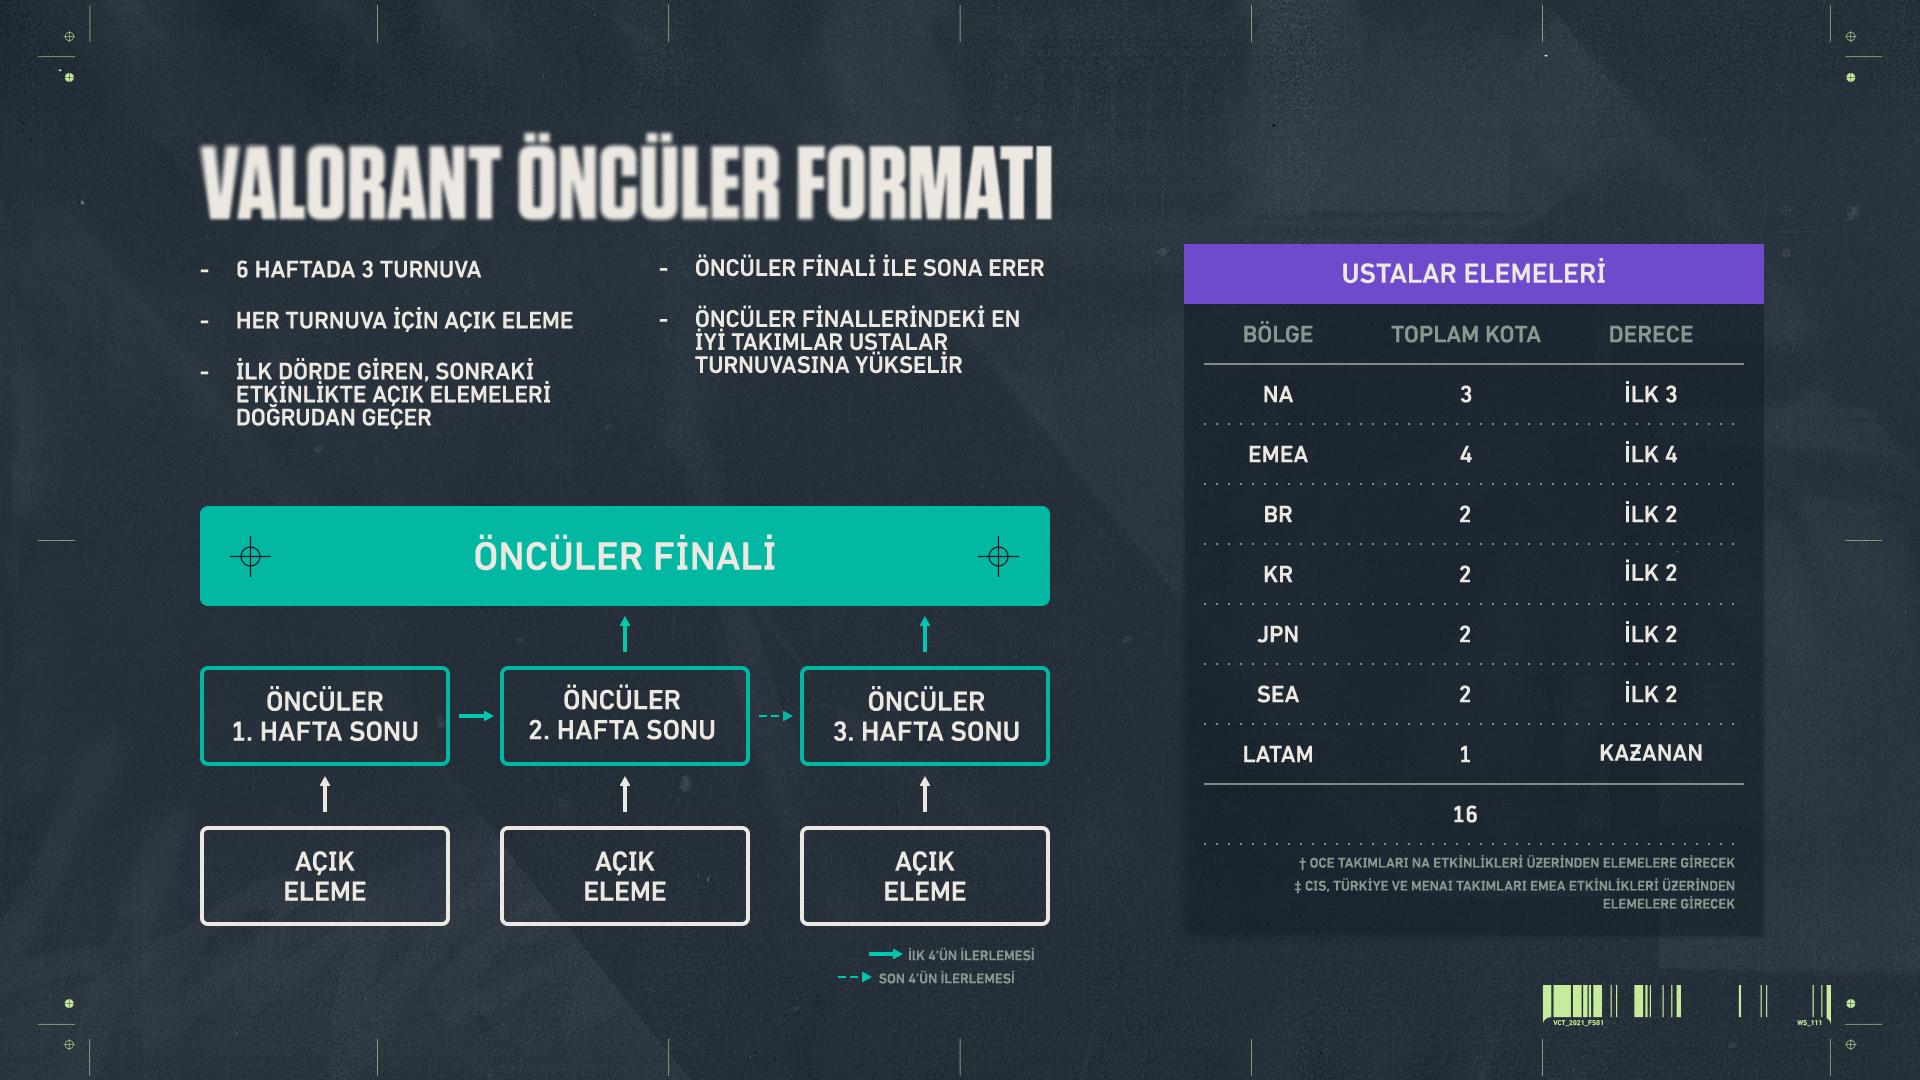 Copy_of_03-challengersformat-v1.0-tur-v2.jpg